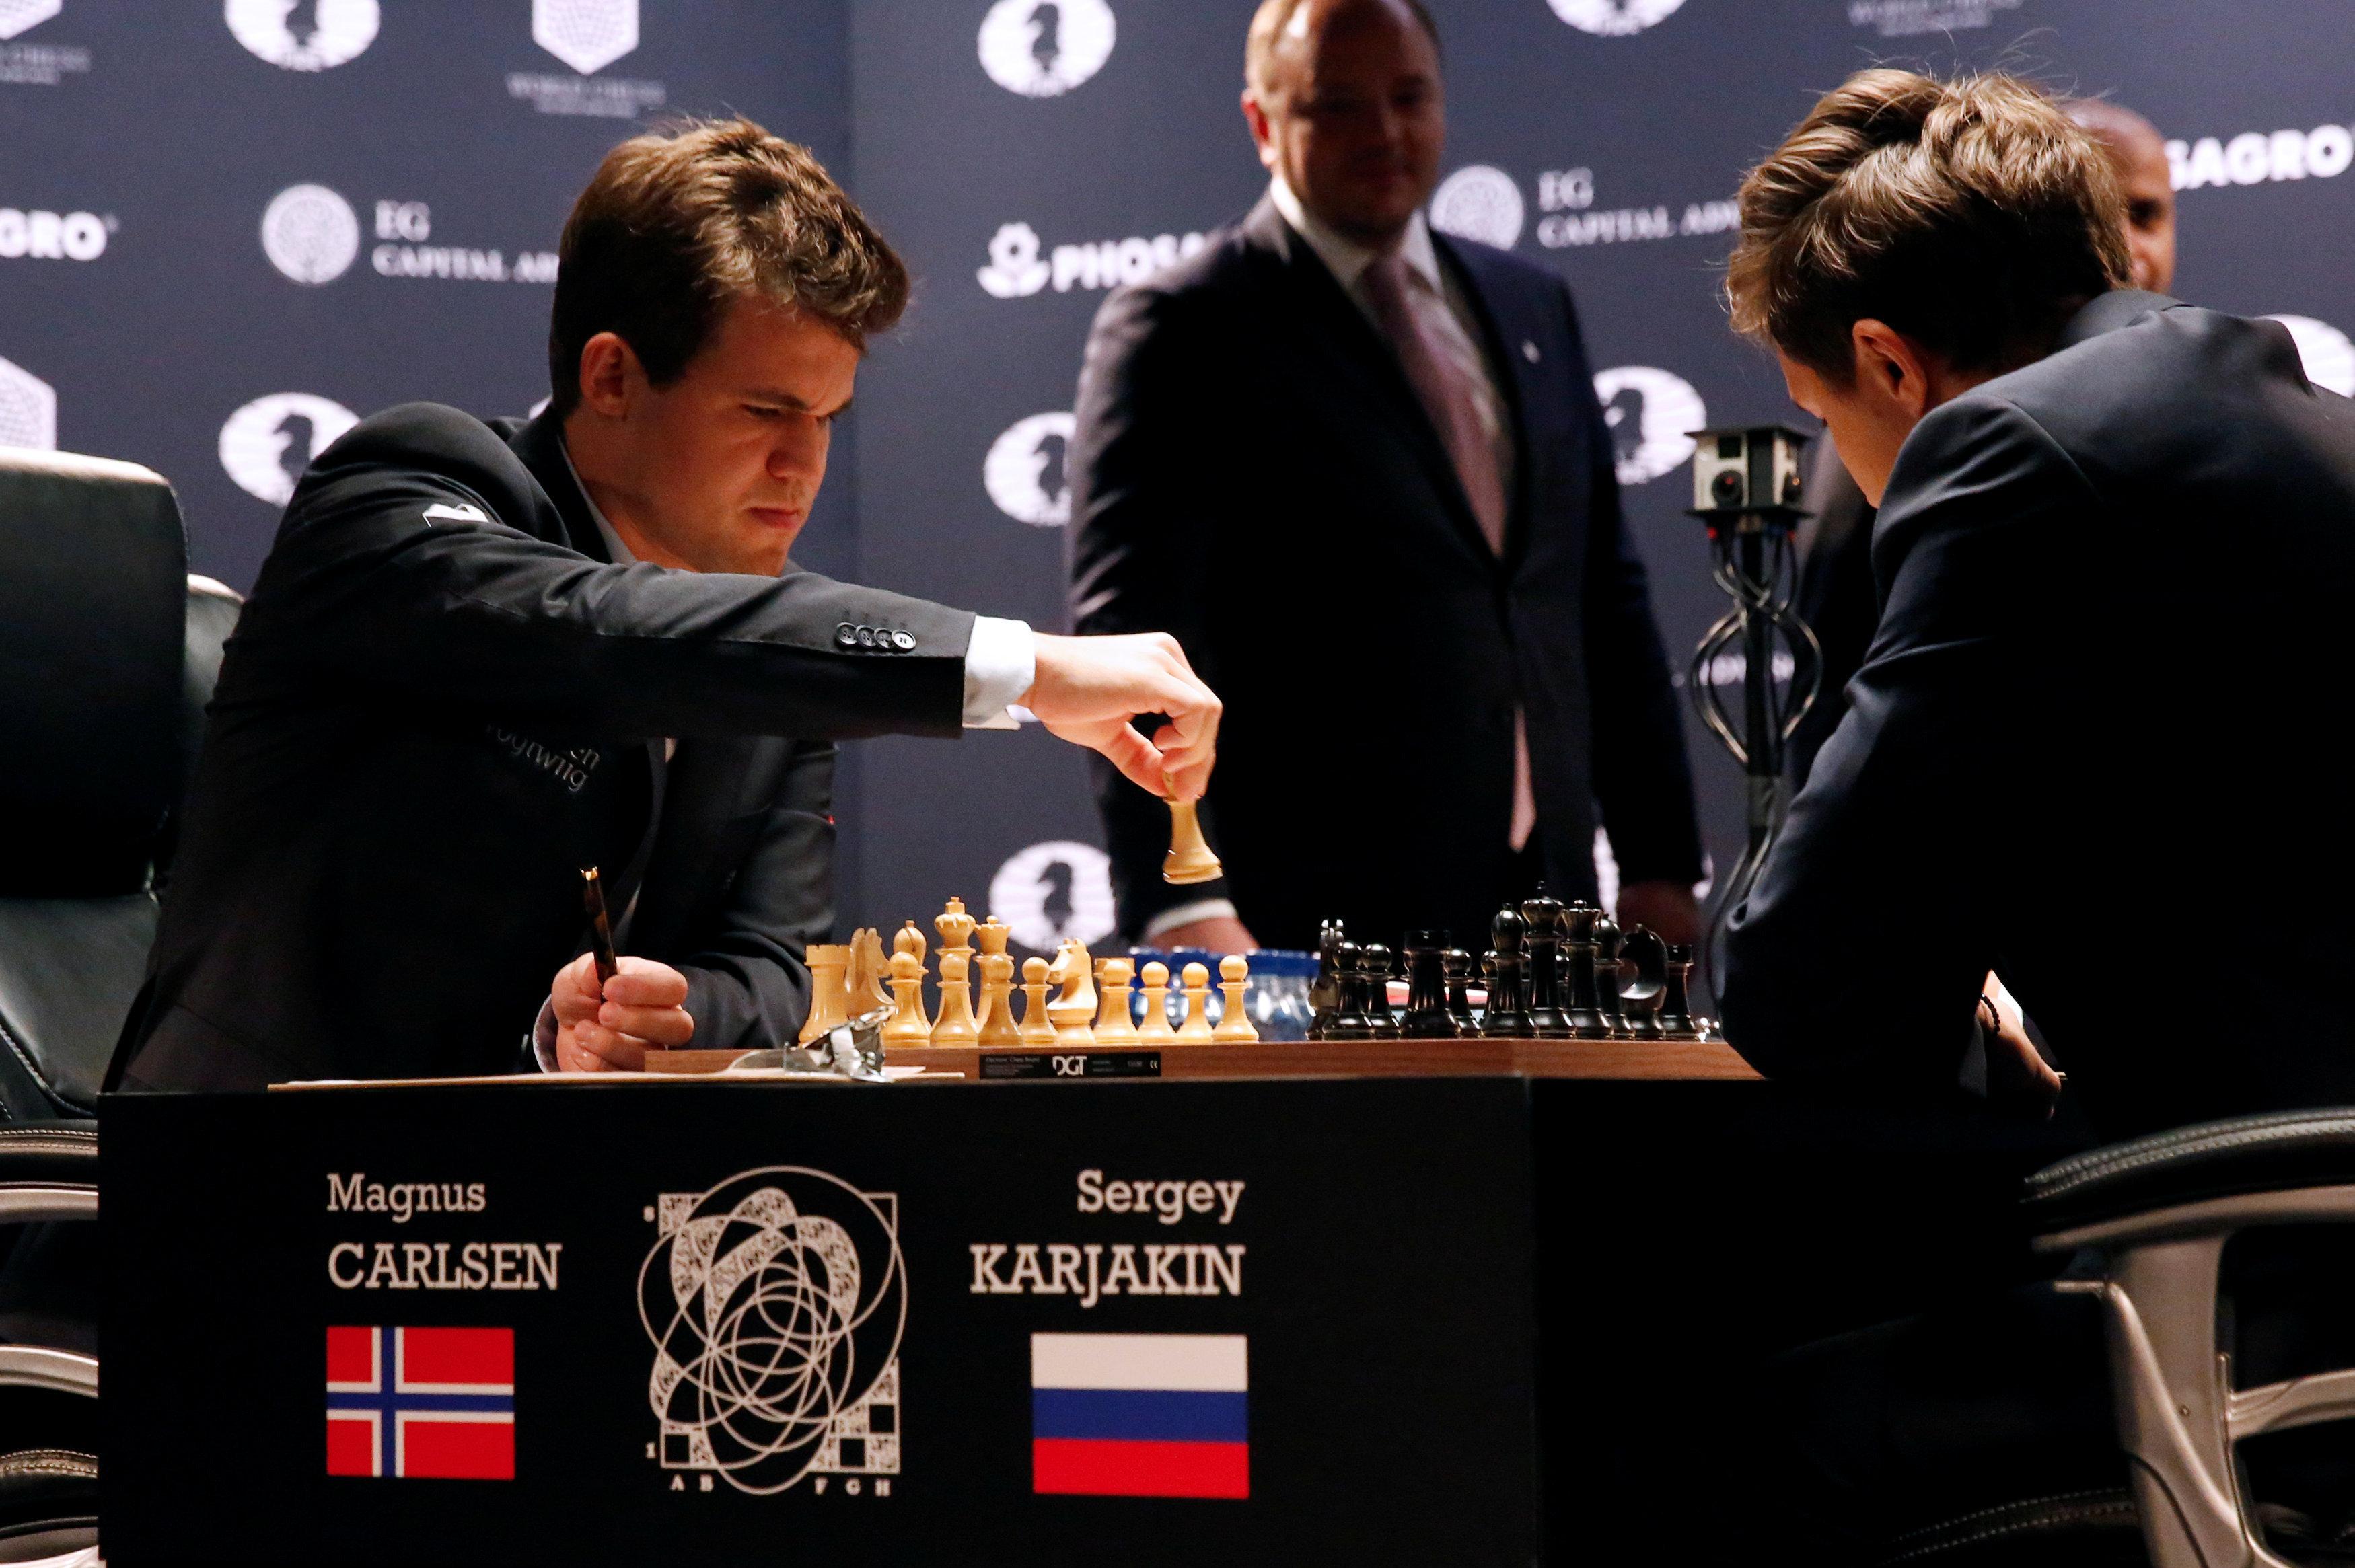 Действующий чемпион мира по шахматам норвежец Магнус Карлсен и российский гроссмейстер Сергей Карякин в матче за звание сильнейшего шахматиста на планете